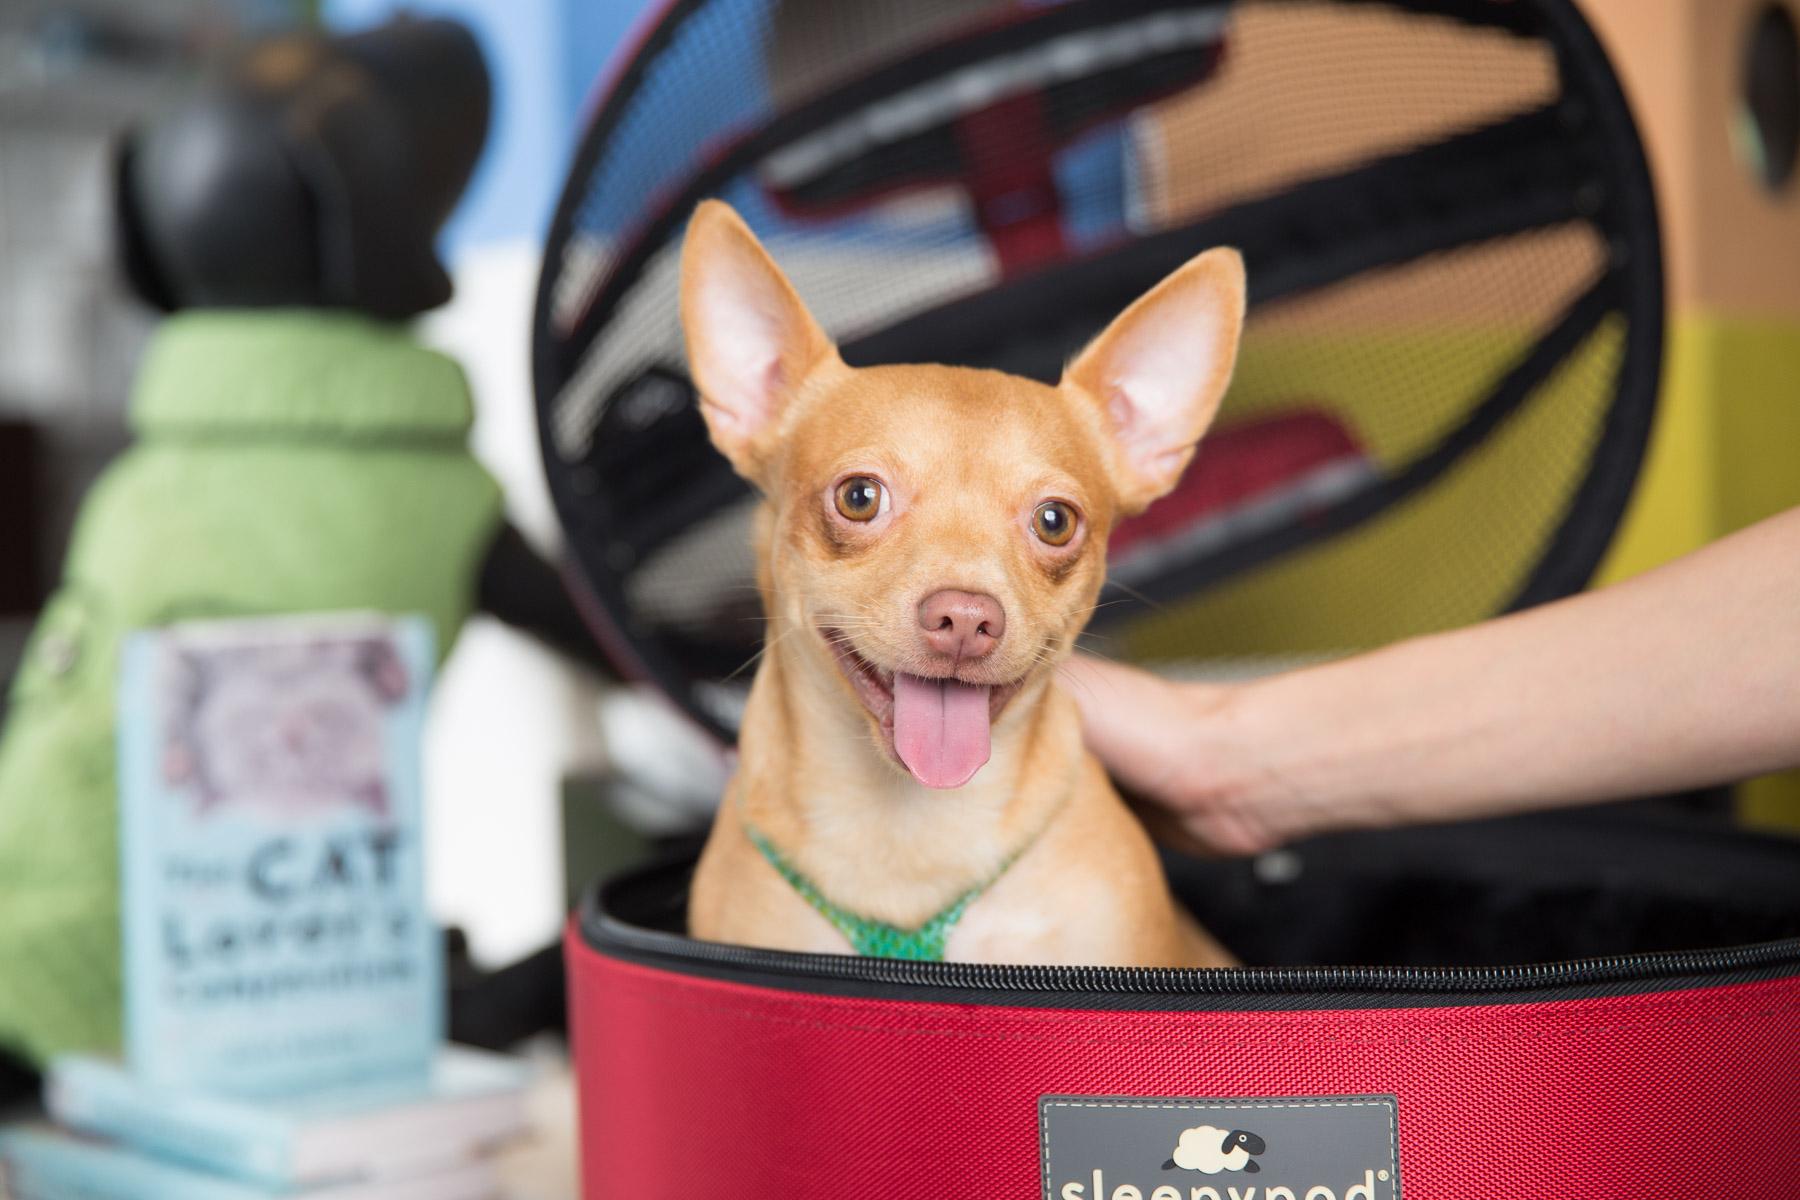 dog-smiling-happy-in-dog-carrier.jpg